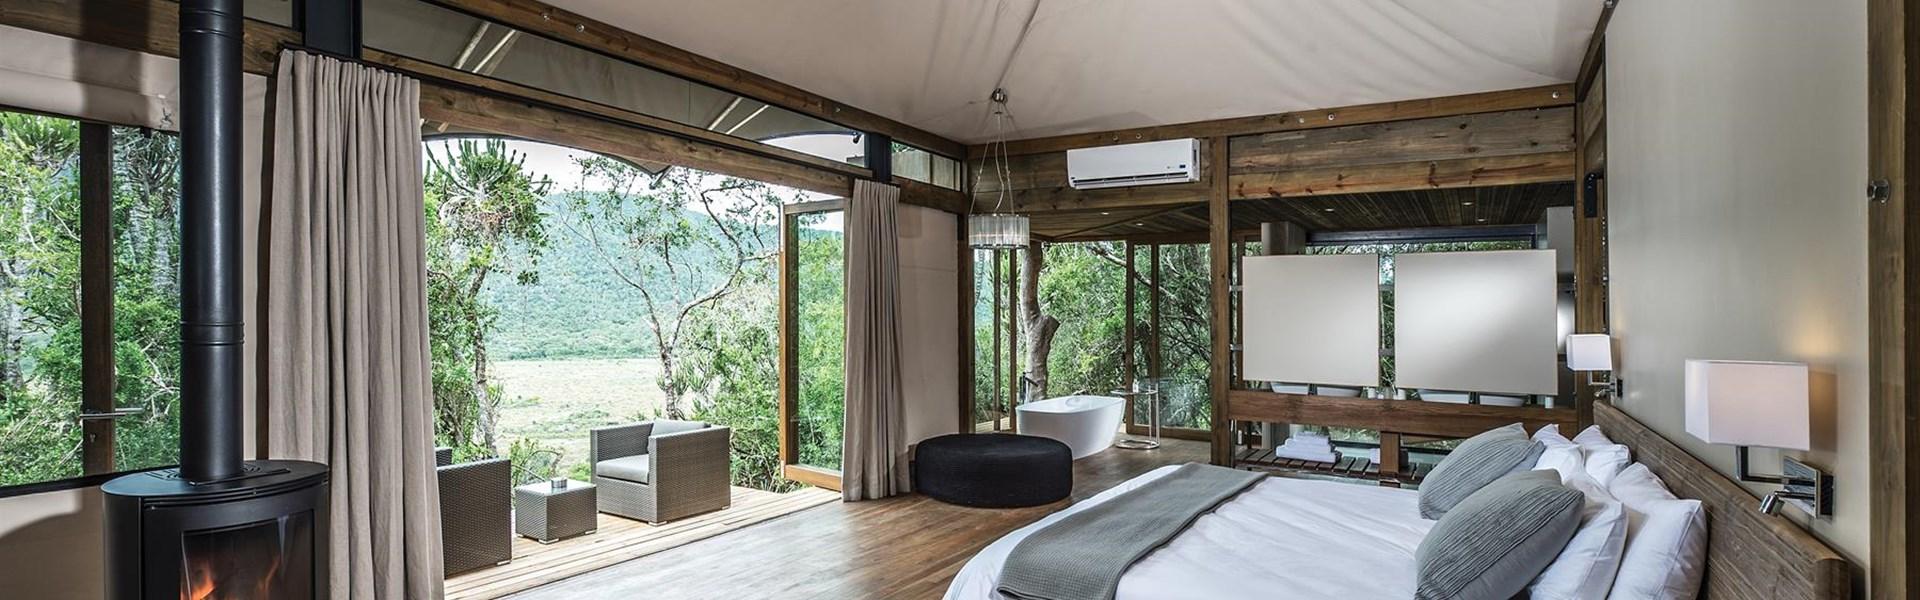 Marco Polo - Settlers Drift - Luxusní safari stan